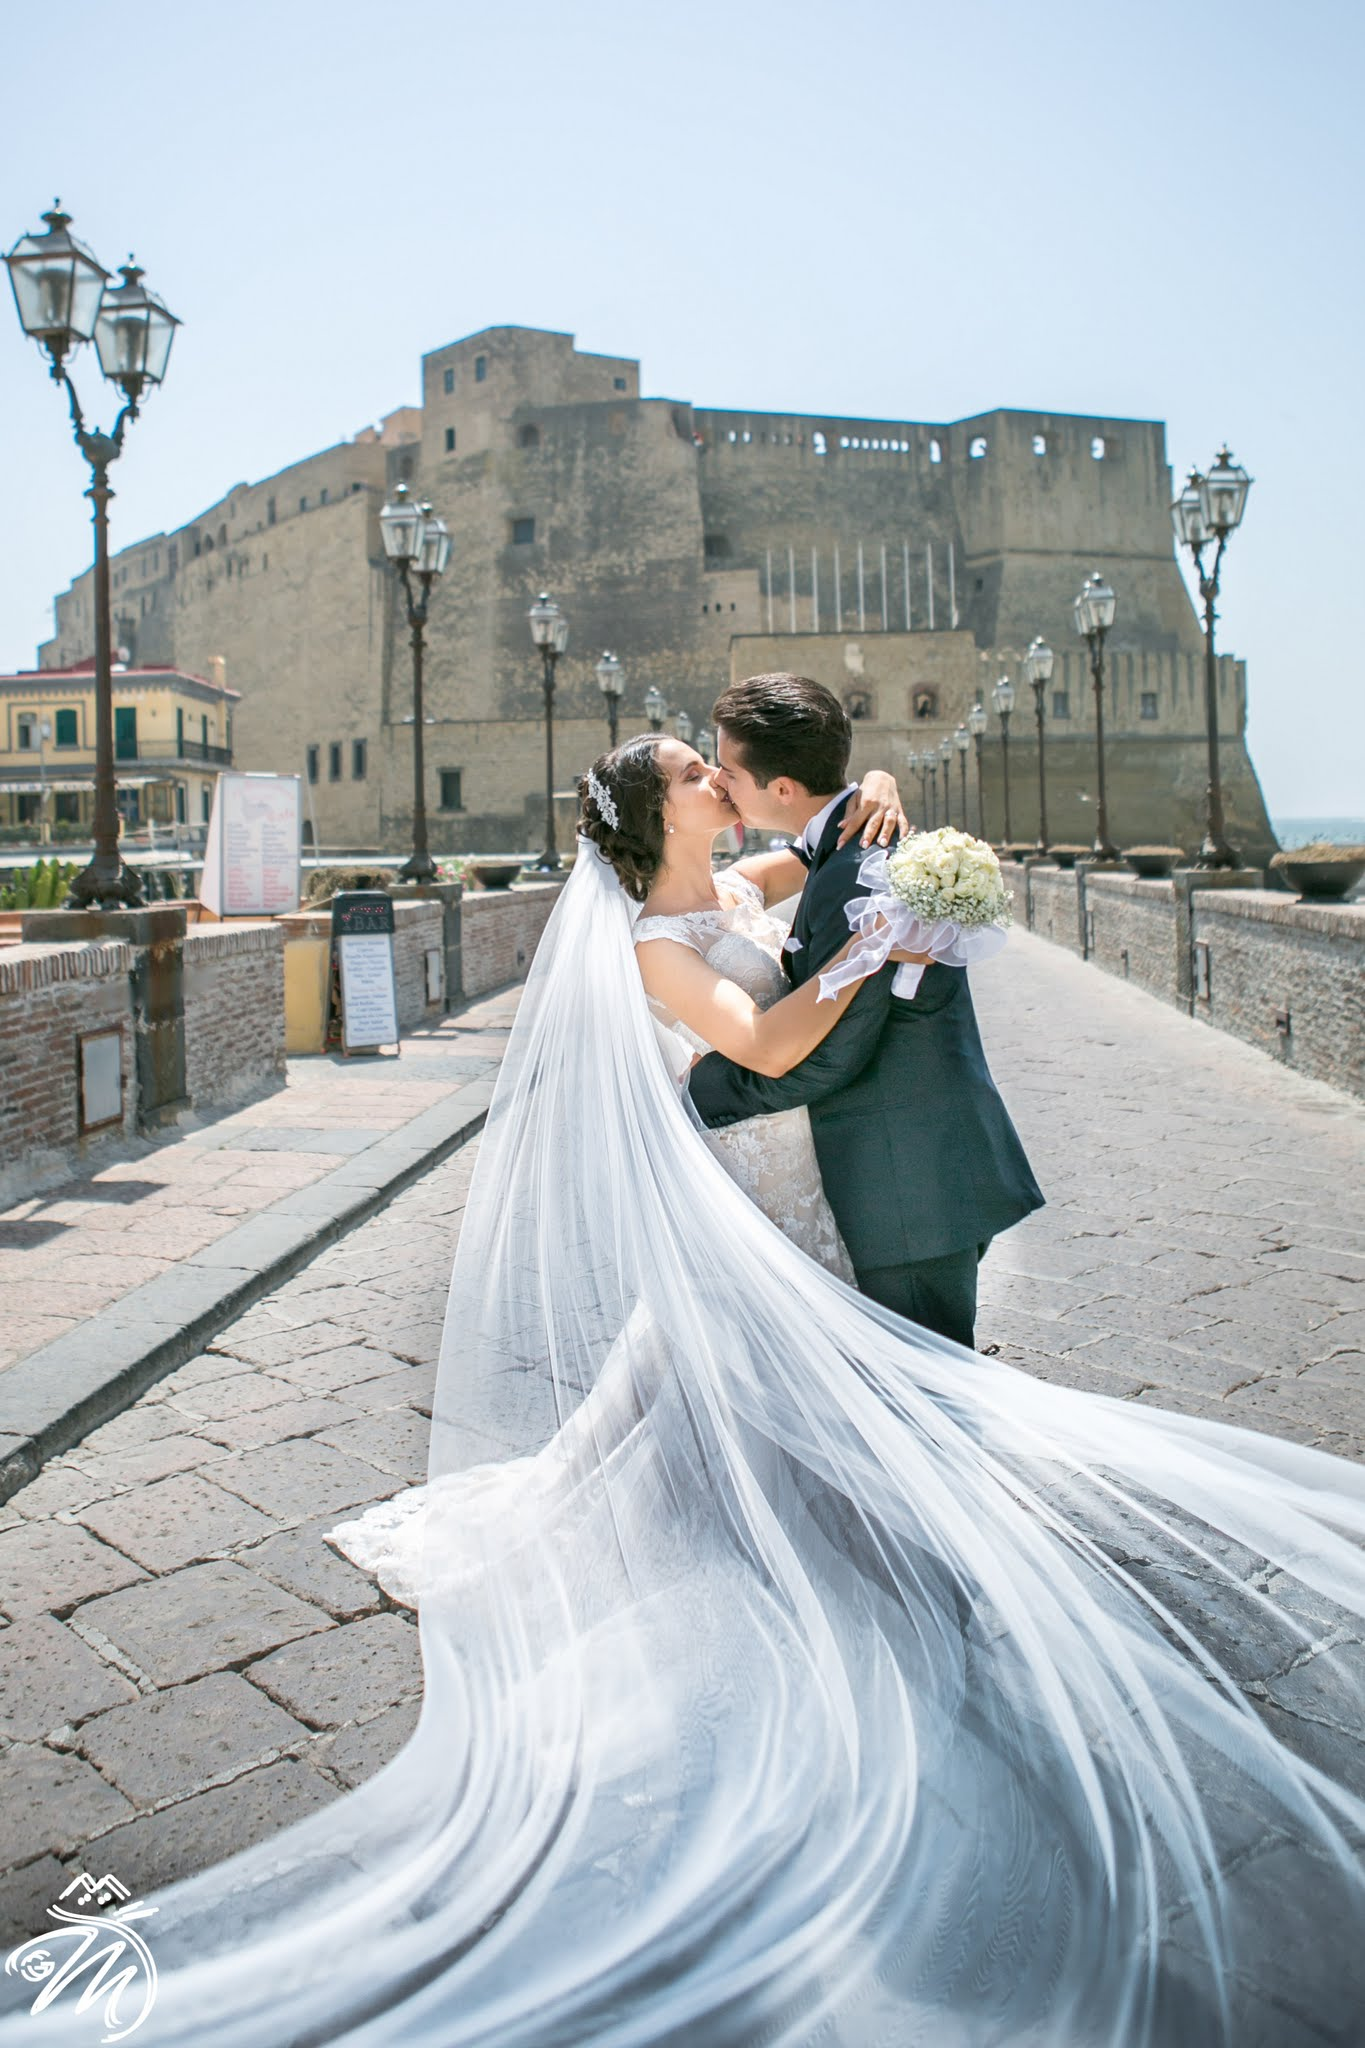 VERTICALI2_LOGO_HOME_PAGE_INTERNATIONAL_PHOTOGRAPHER_IN_ROME_WEDDING_DESTINATION_GIROLAMO_MONTELEONE_-59